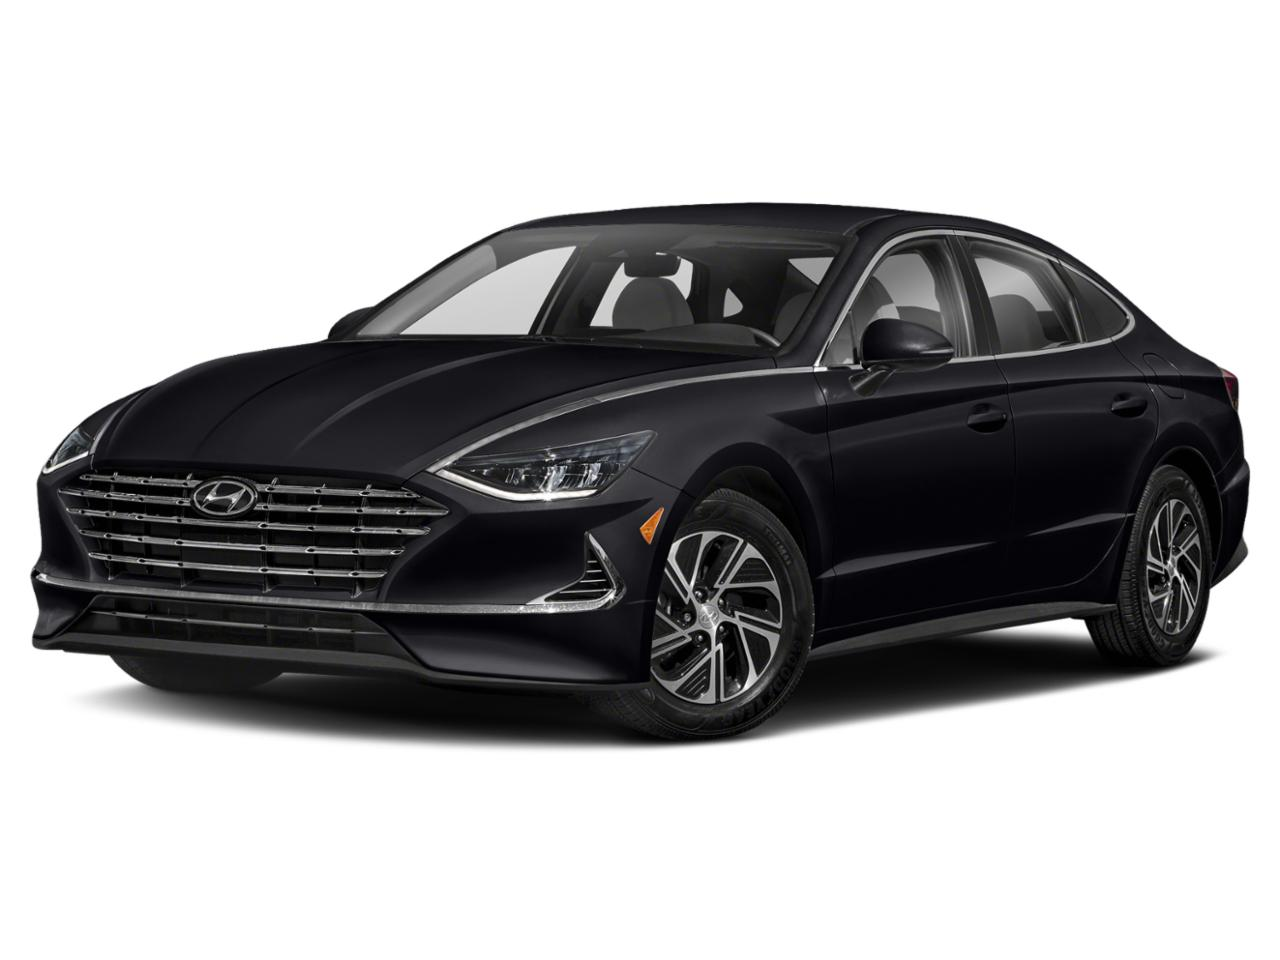 2022 Hyundai Sonata Hybrid Vehicle Photo in O'Fallon, IL 62269